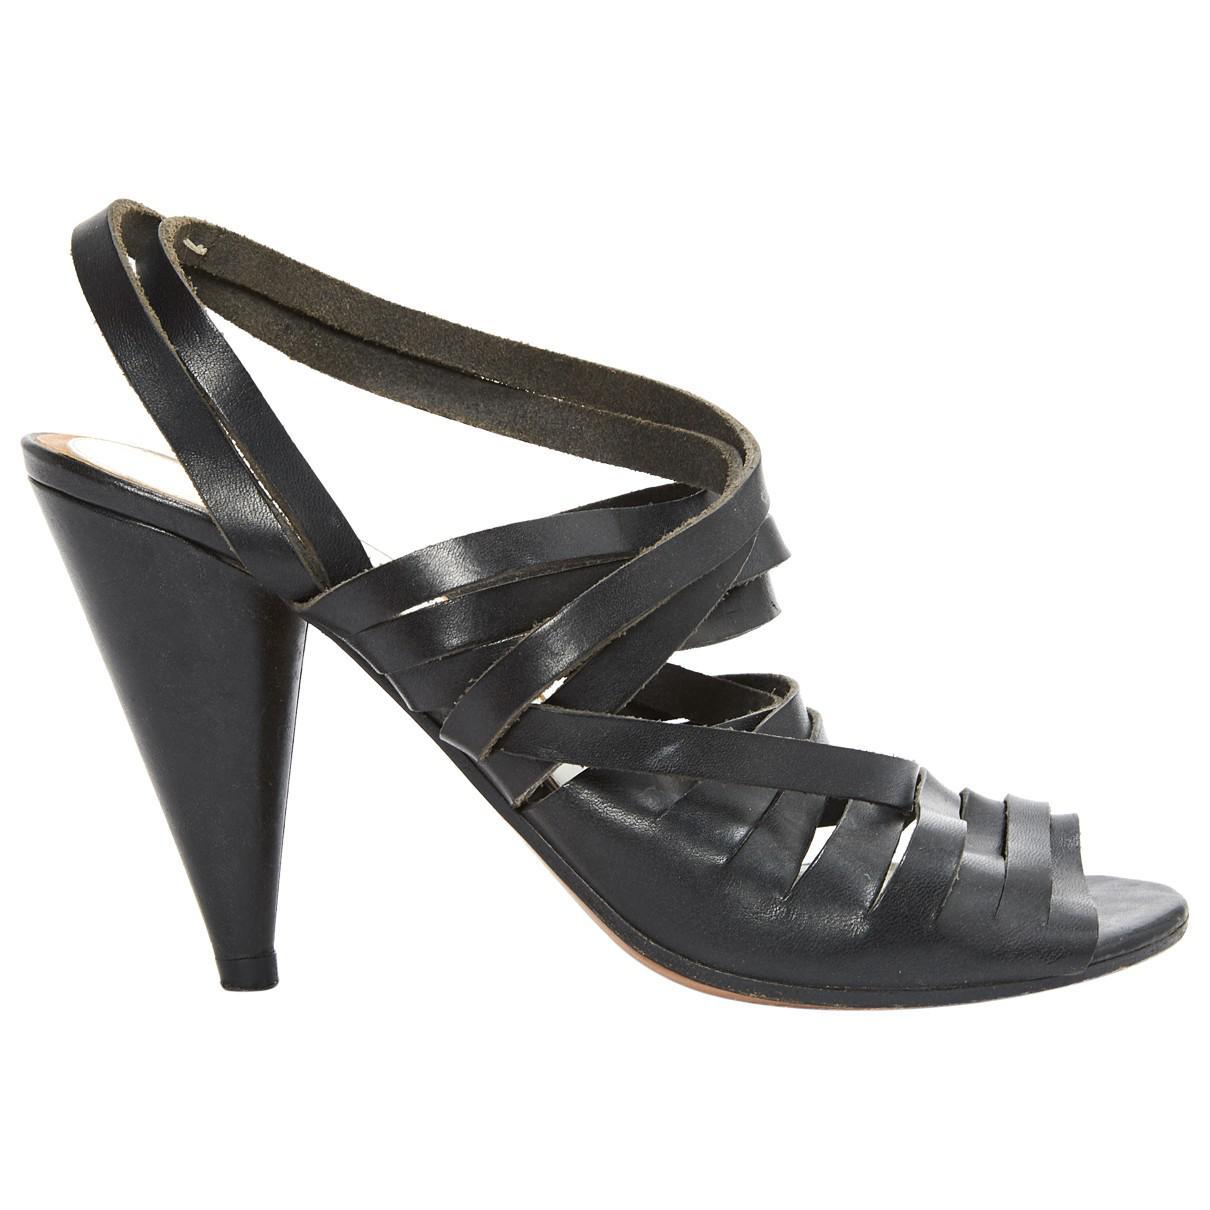 Pre-owned - Leather sandal Maison Martin Margiela l6c9uWgHm